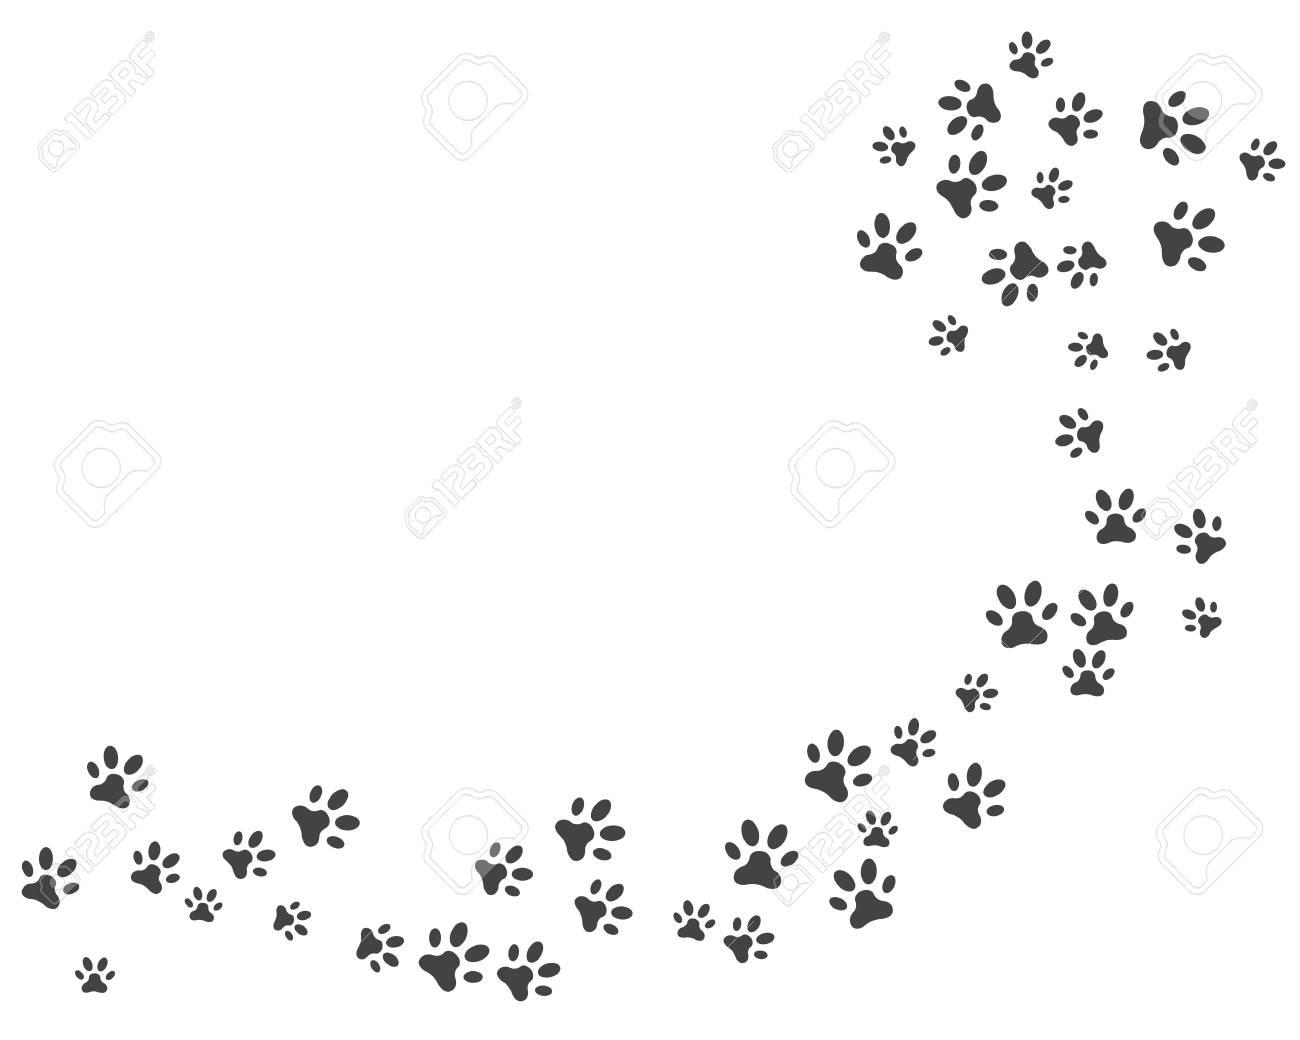 Paw icon vector illustration design logo template - 106357336